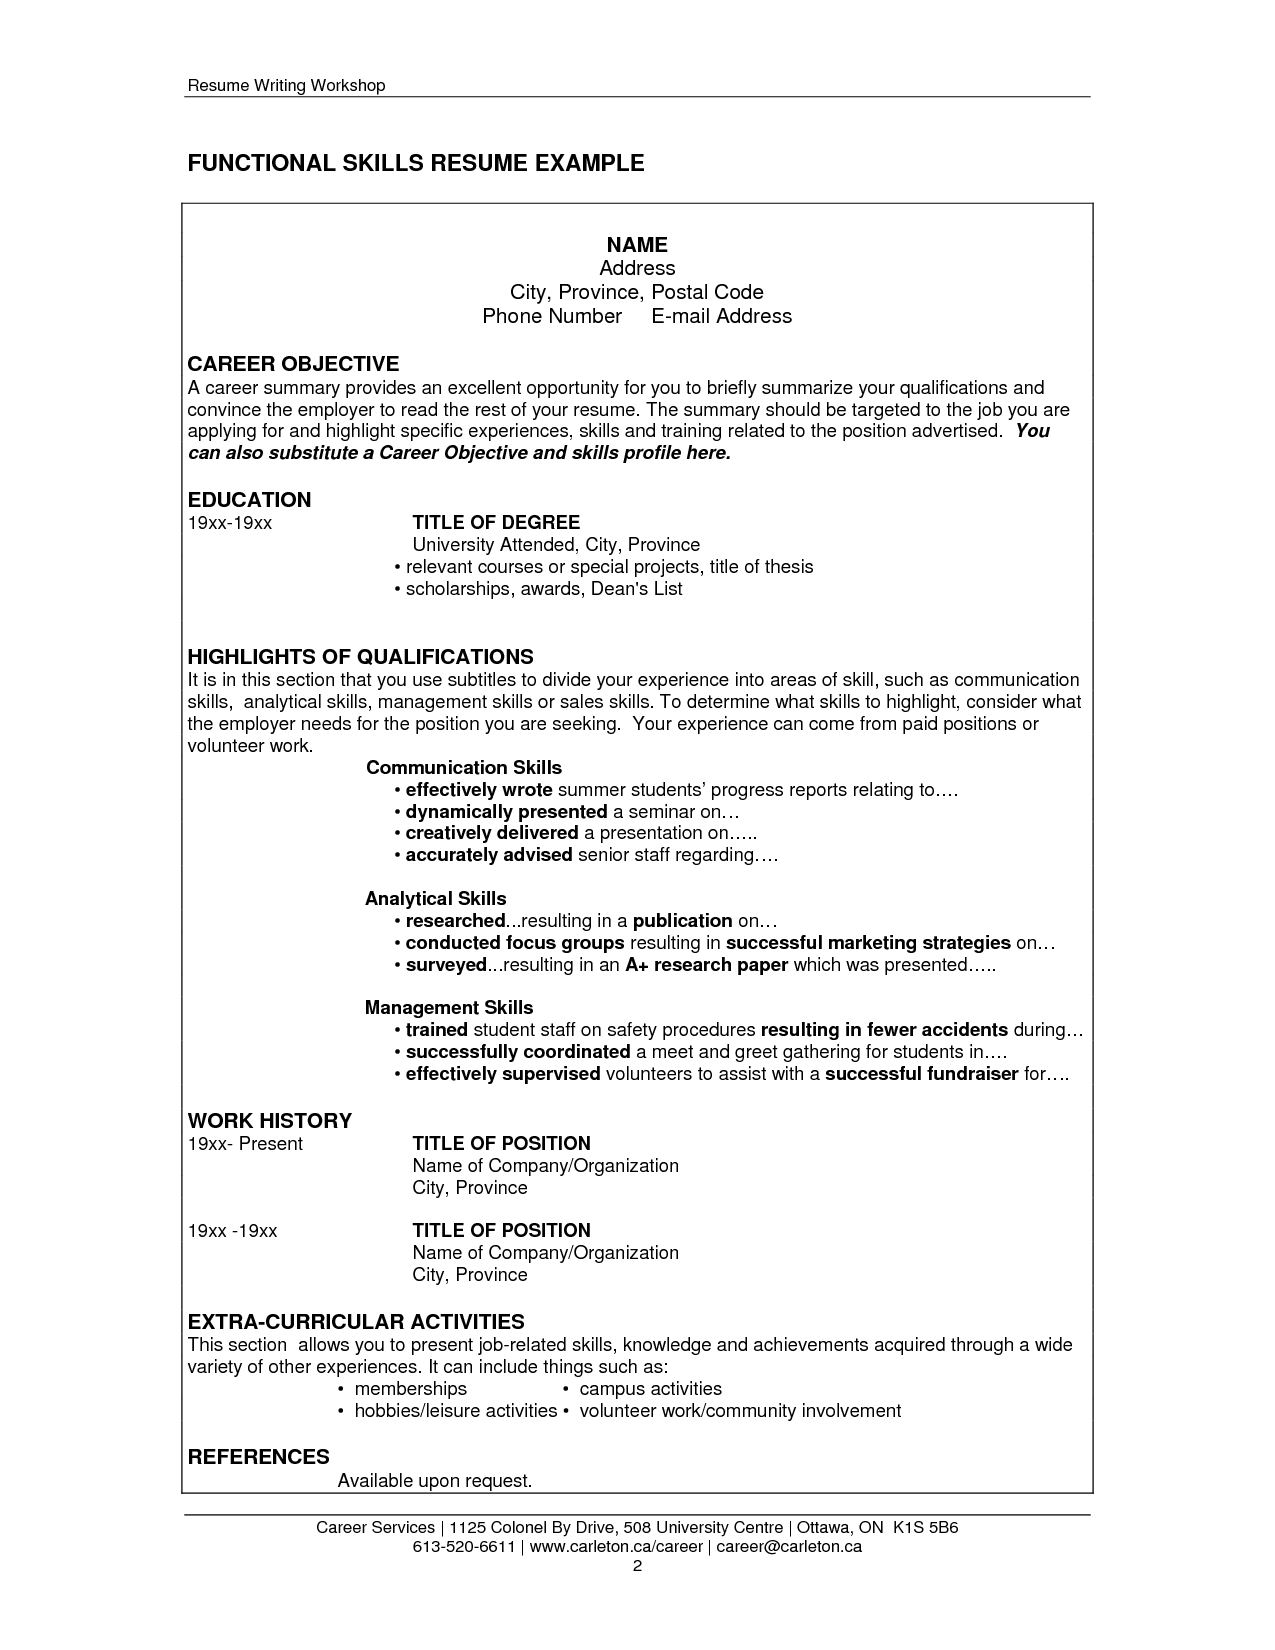 Resume 201209